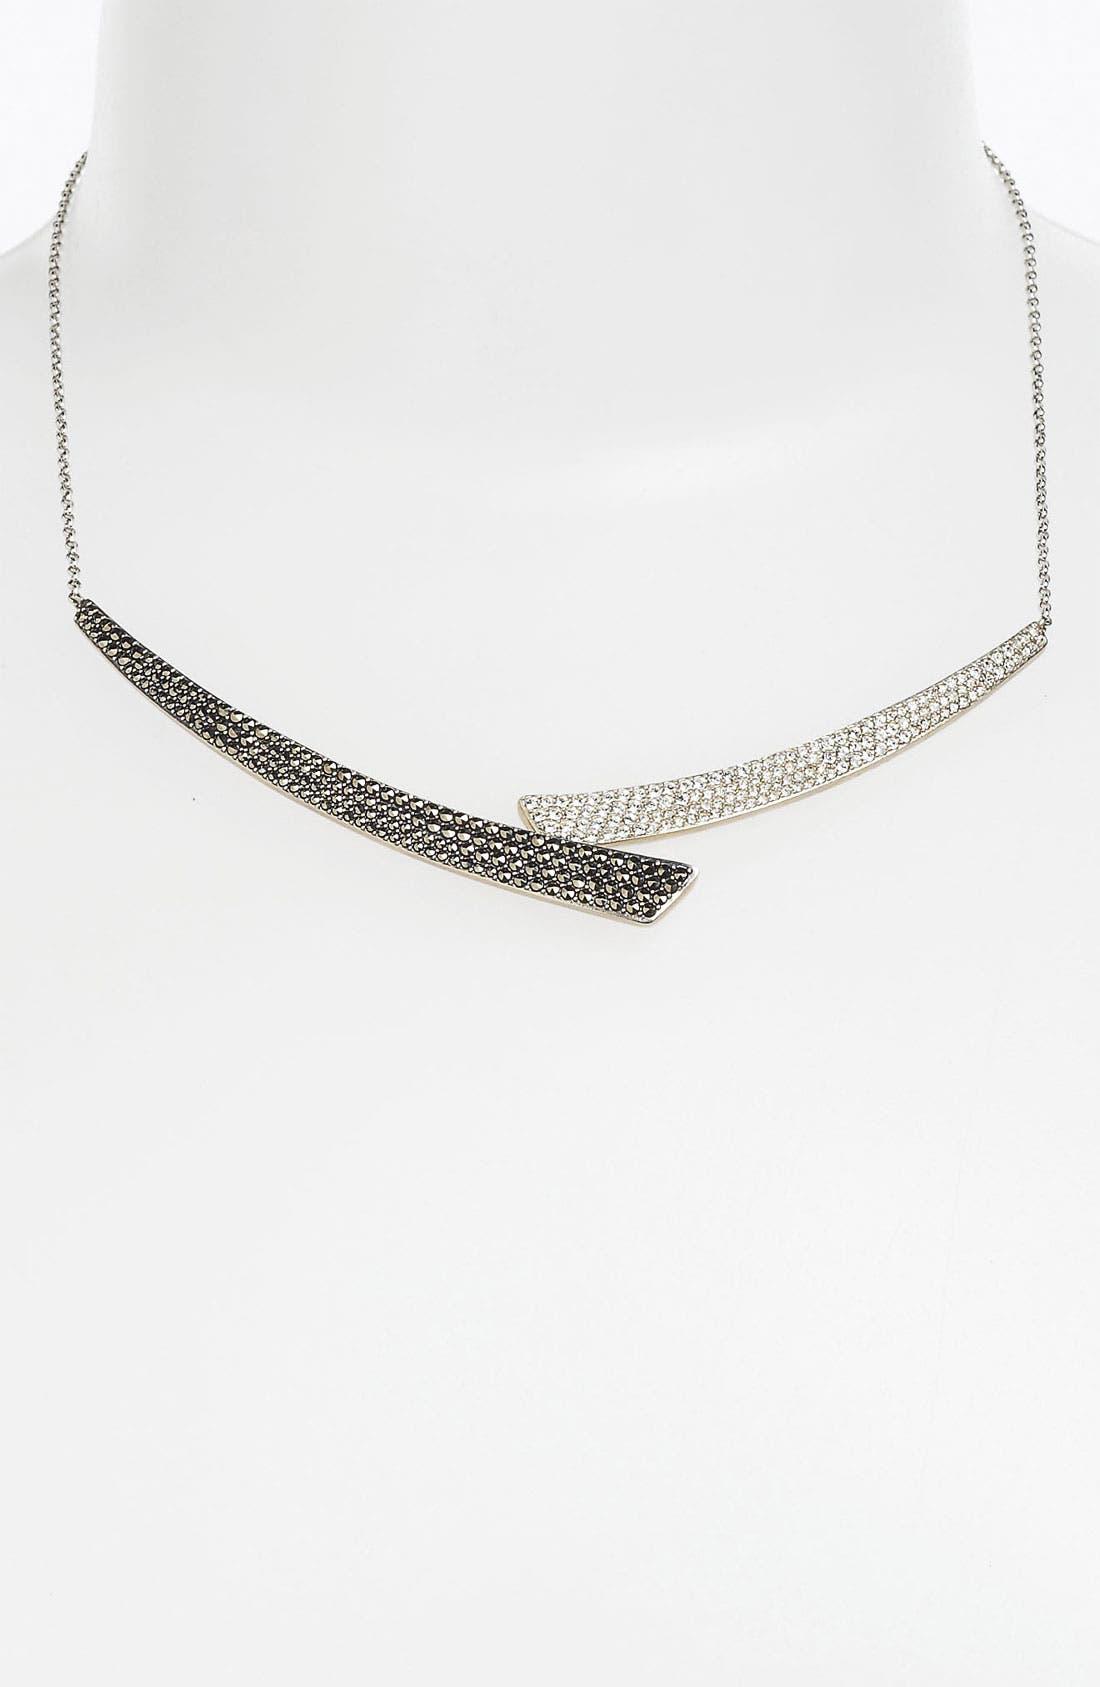 Main Image - Judith Jack 'Crystal Glitz' Collar Necklace